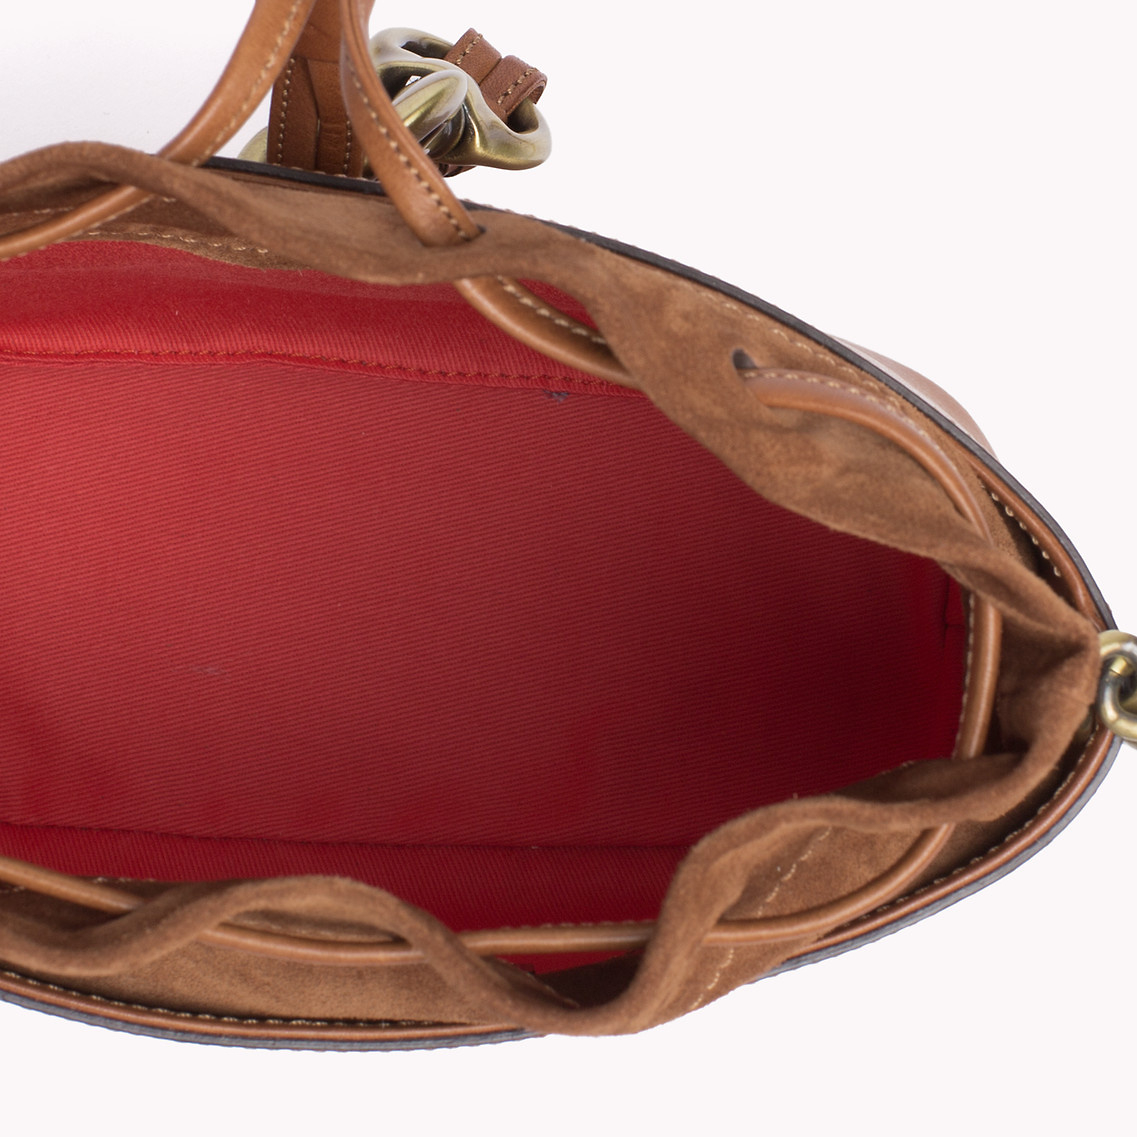 tommy hilfiger small bucket bag in brown lyst. Black Bedroom Furniture Sets. Home Design Ideas